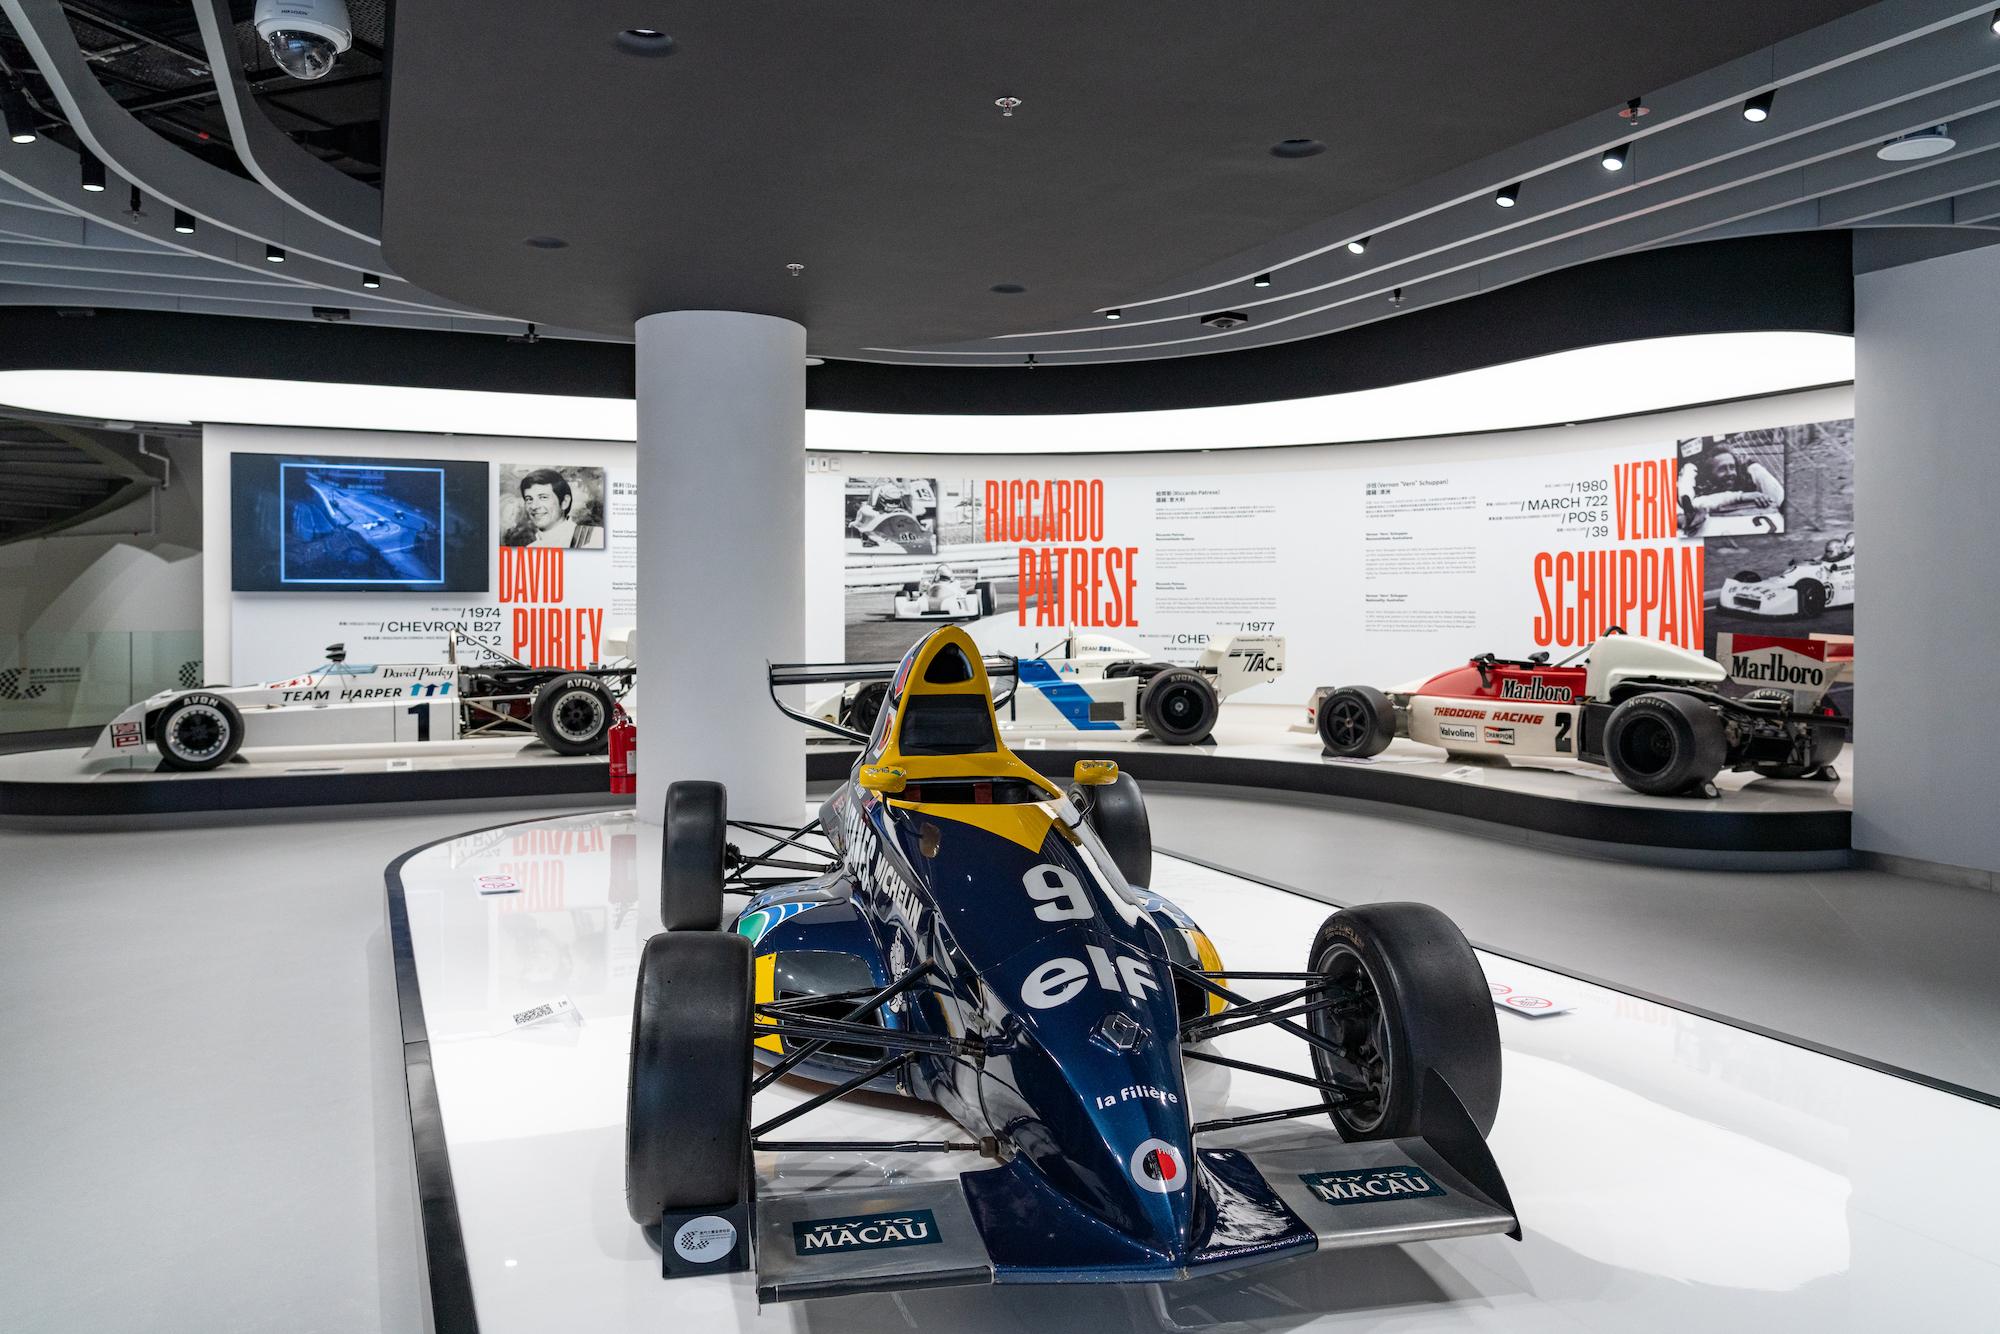 Formula cars of David Purley, Riccardo Paterse and Vern Schuppan